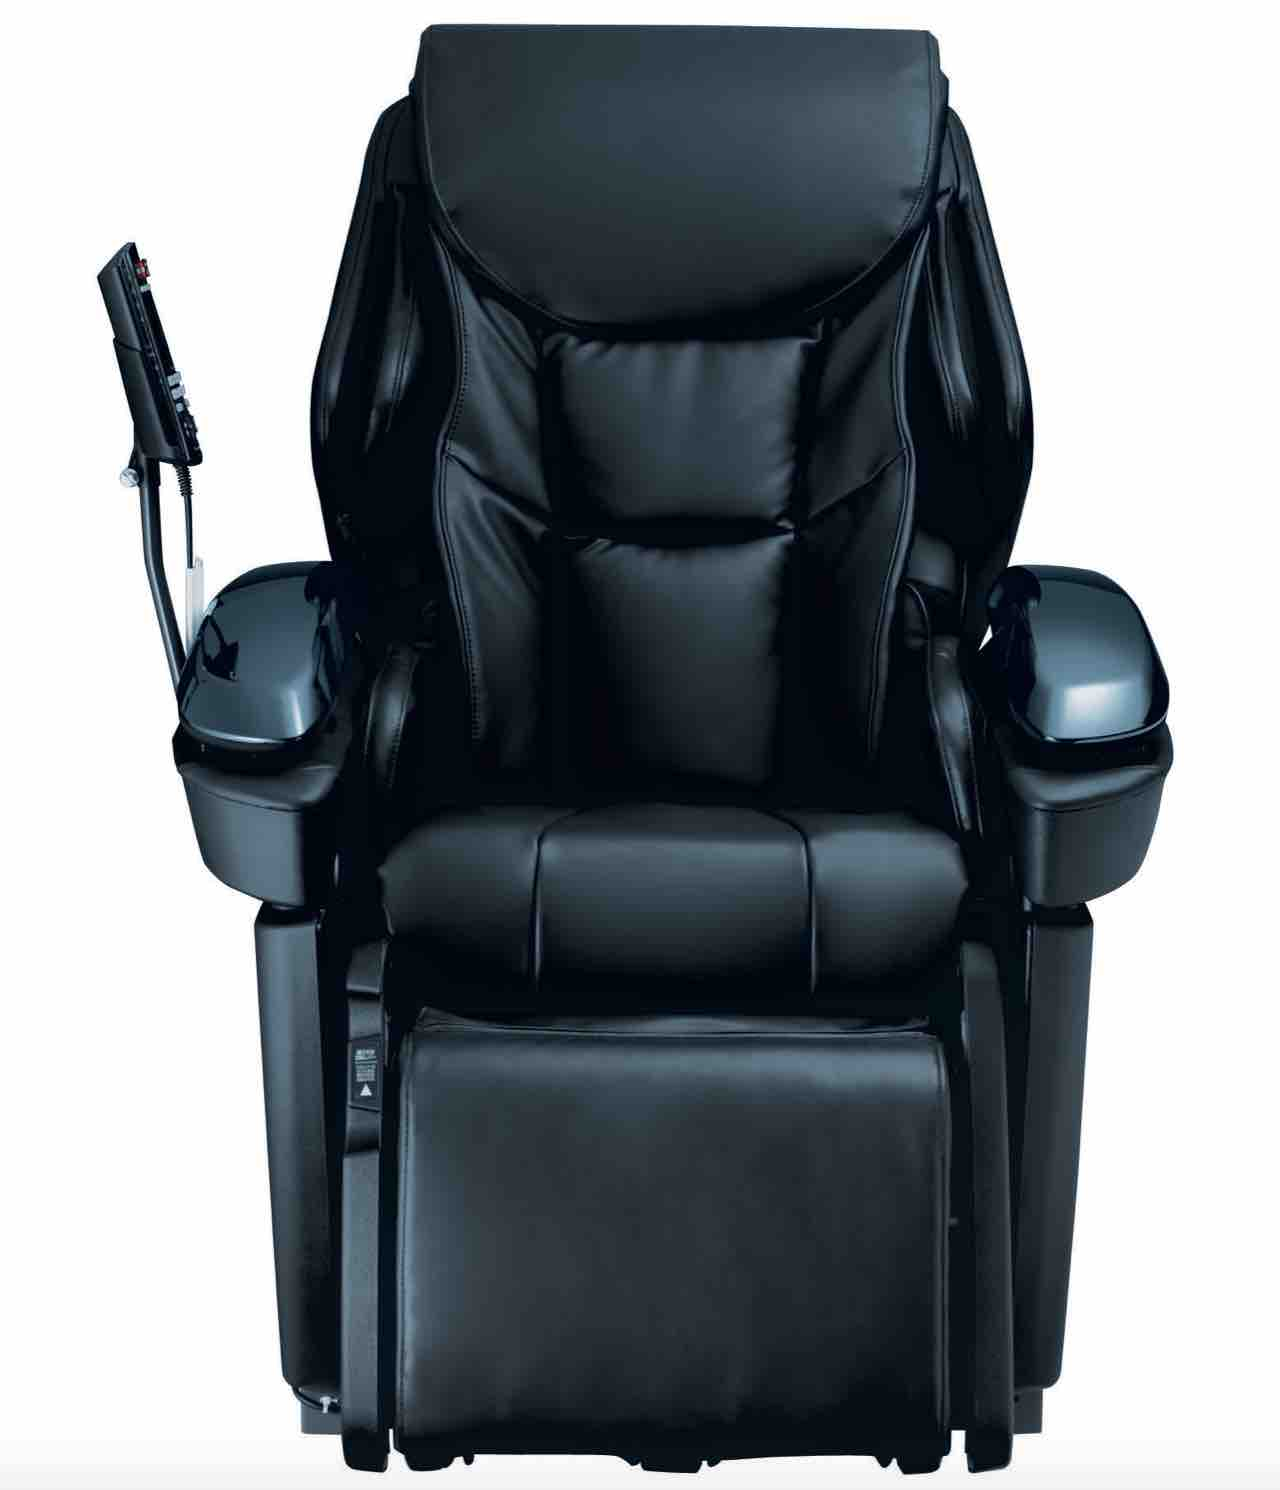 Fauteuil de massage Panasonic EP-MA70 3